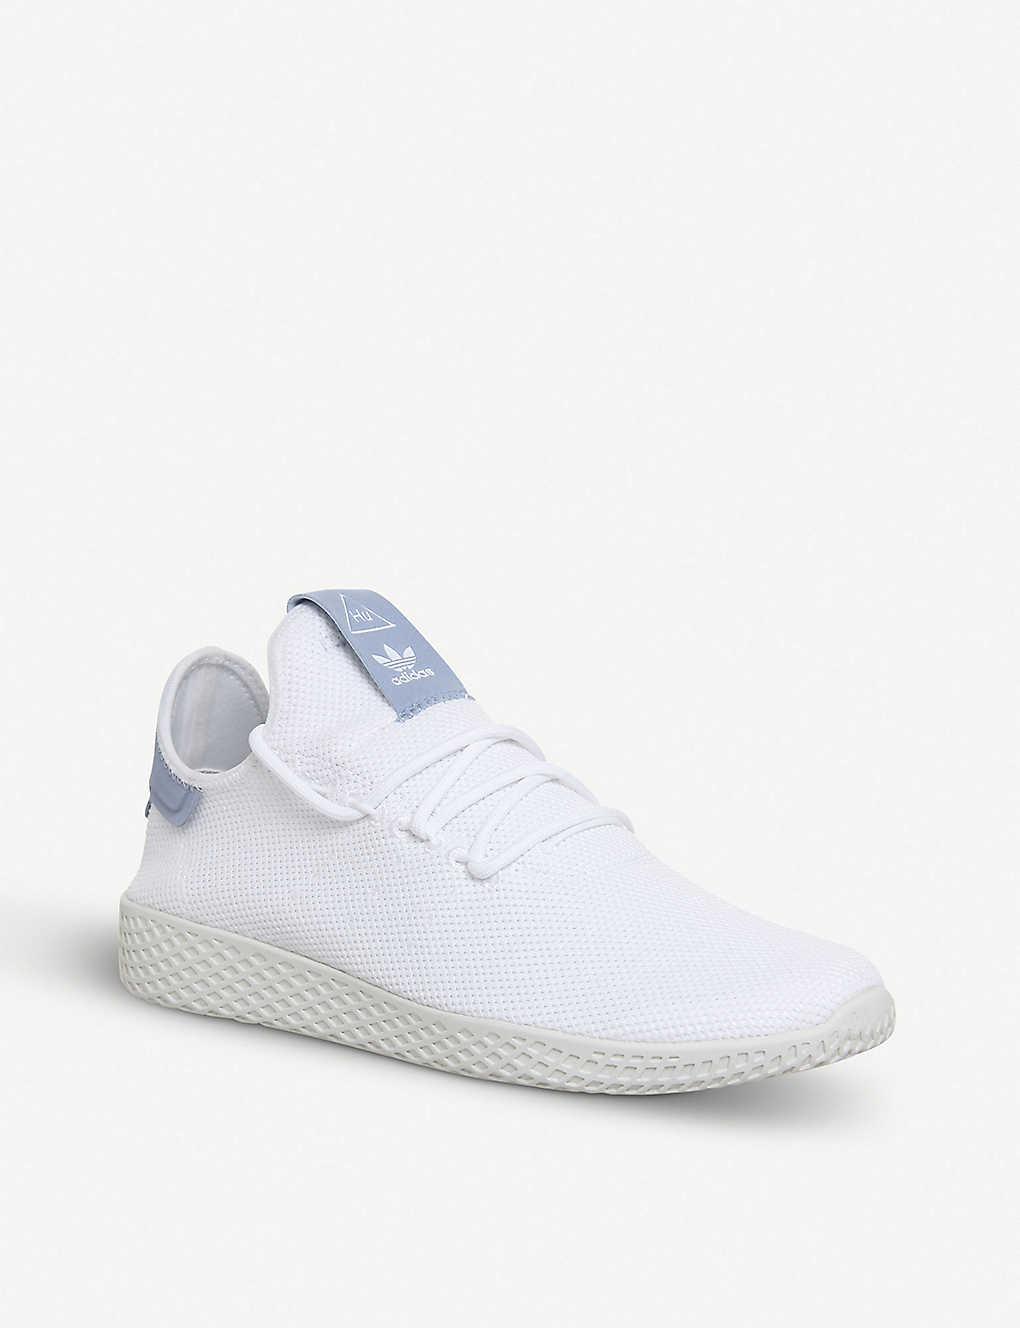 8aac10ece2d74 ... Pharrell Williams Tennis Hu mesh trainers - White white blue ...